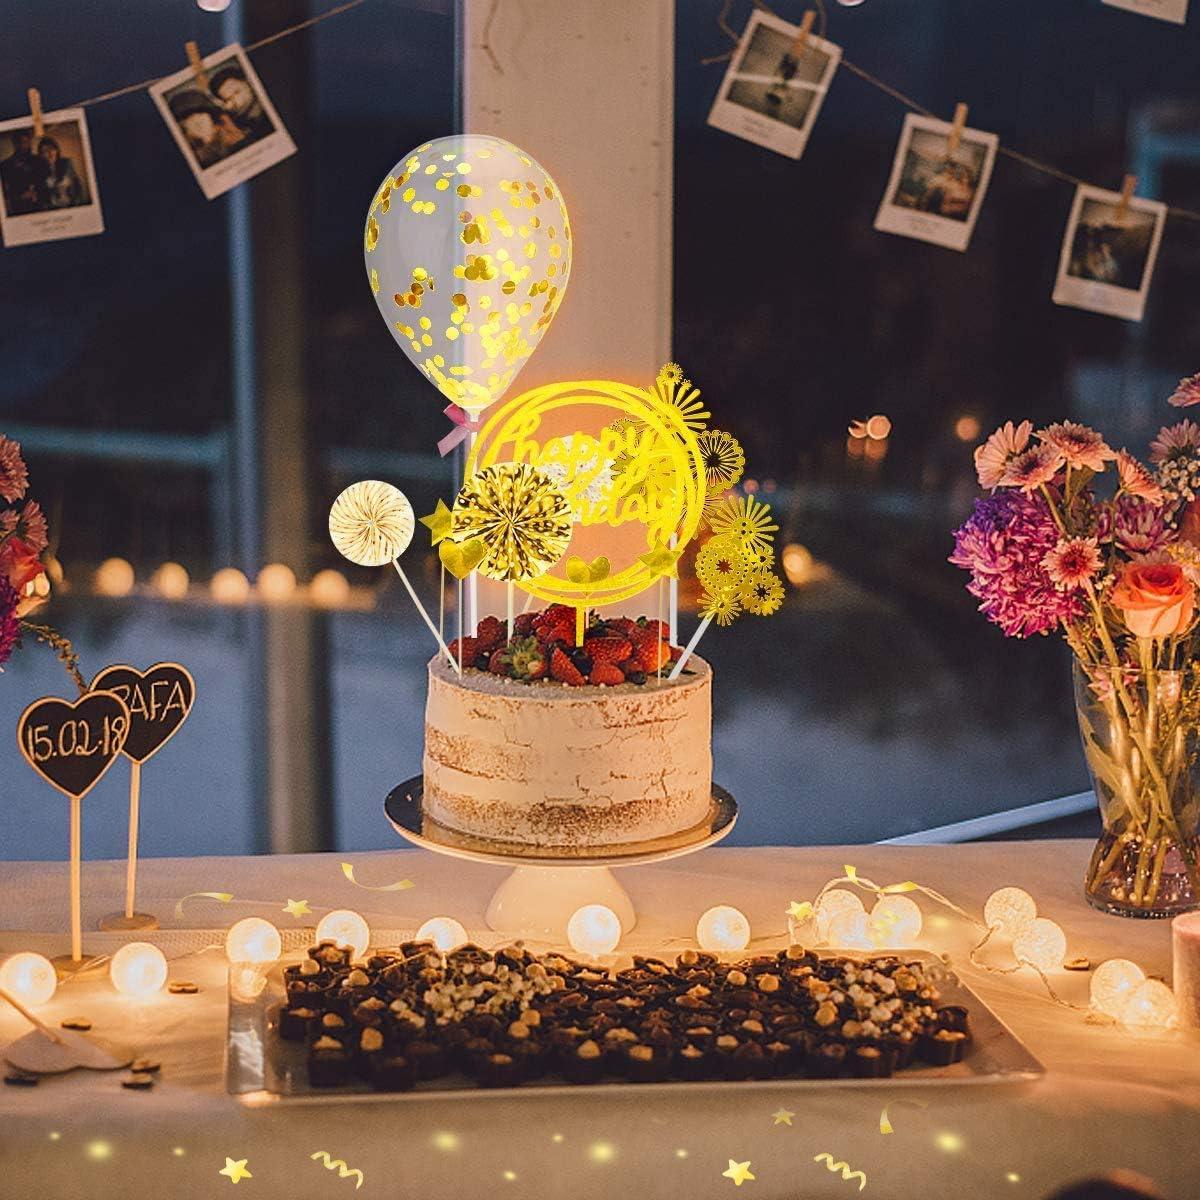 Torta Toppers de Cumplea/ños Cake Topper Happy Birthday Cake Toppe pasteles Decoraci/ón Happy Birthday Cupcake Topper Set Golden Topper Torta Toppers para Decorations Suministros para Fiestas